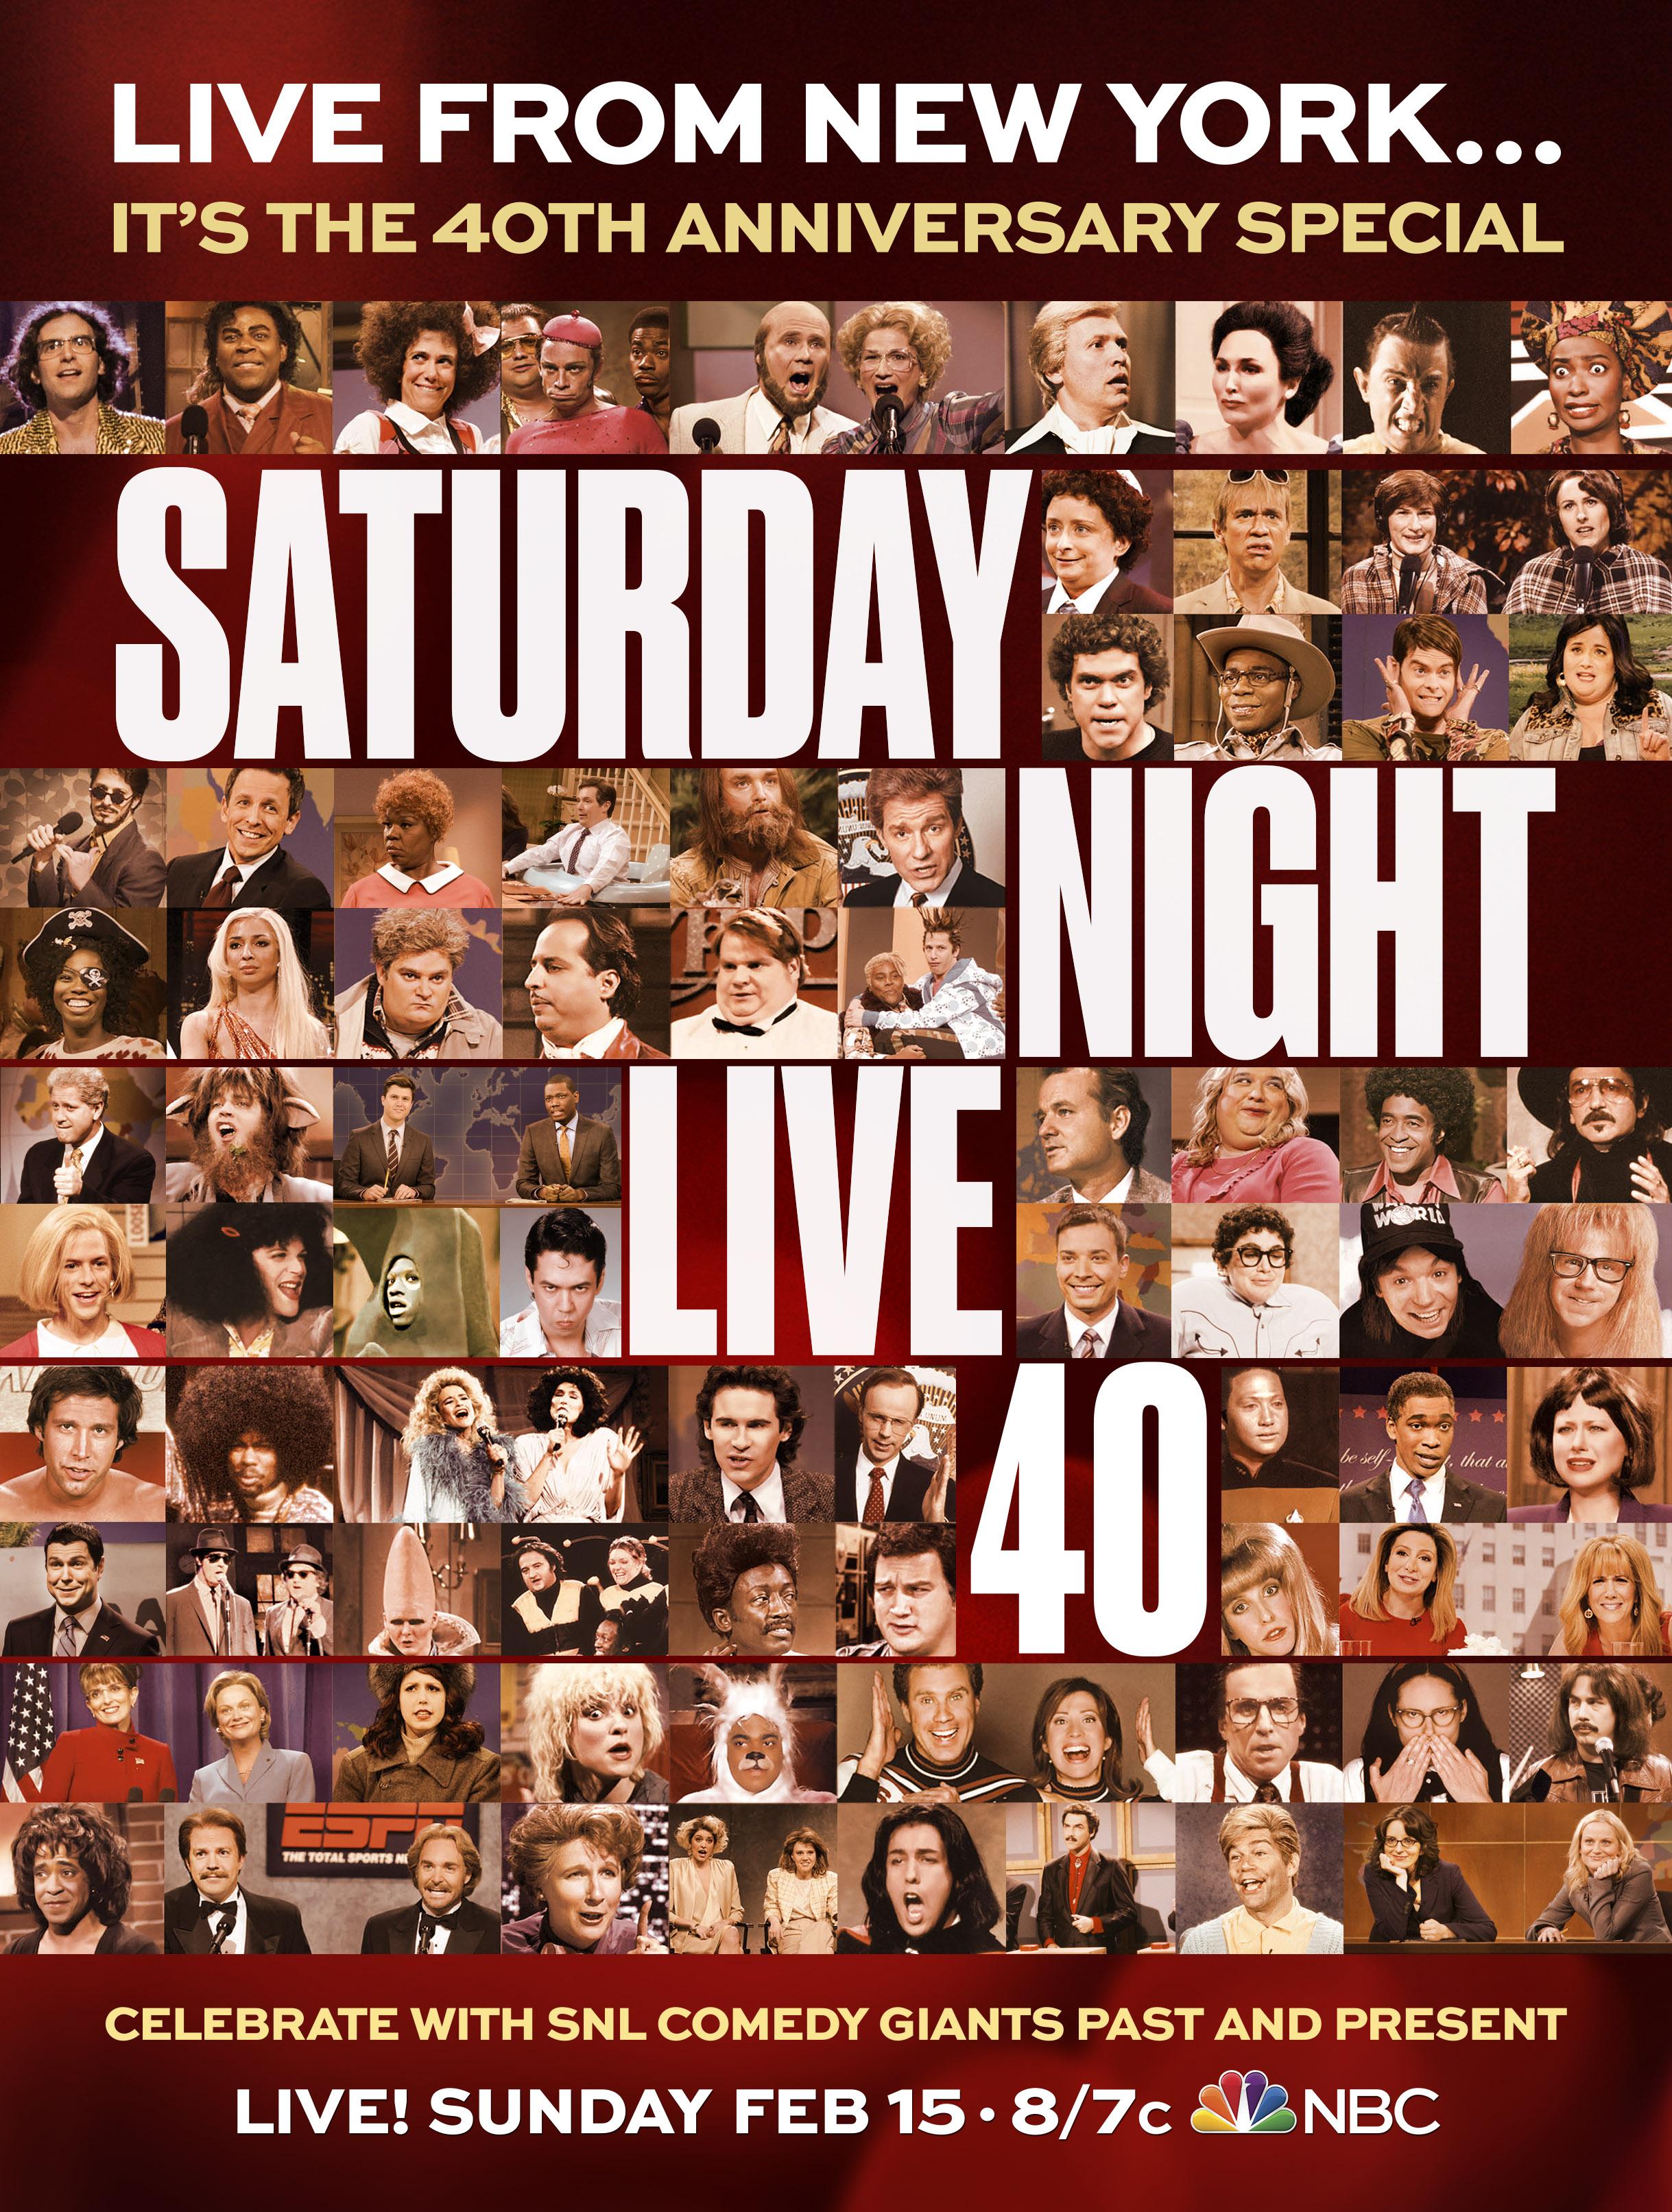 SNL 40th Anniversary Special - NBC.com